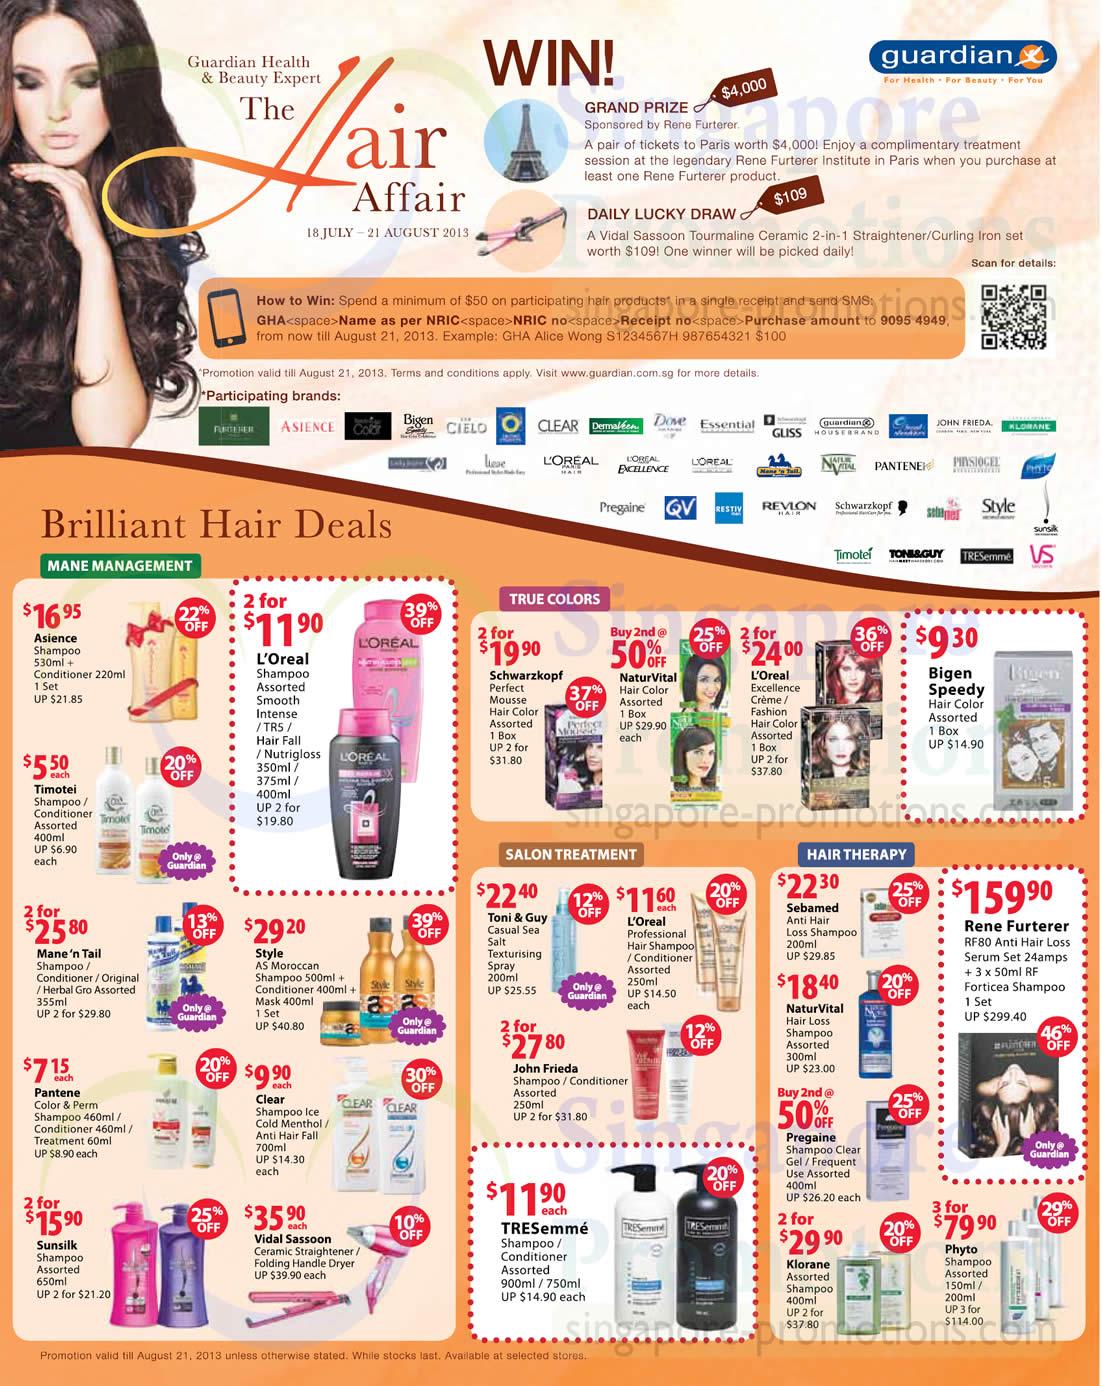 Vidal Sassoon Ceramic Straightener , Vidal Sassoon Folding Handle Dryer, Toni & Guy Casual Sea Salt Texturising Spray and Sebamed Anti Hair Loss Shampoo